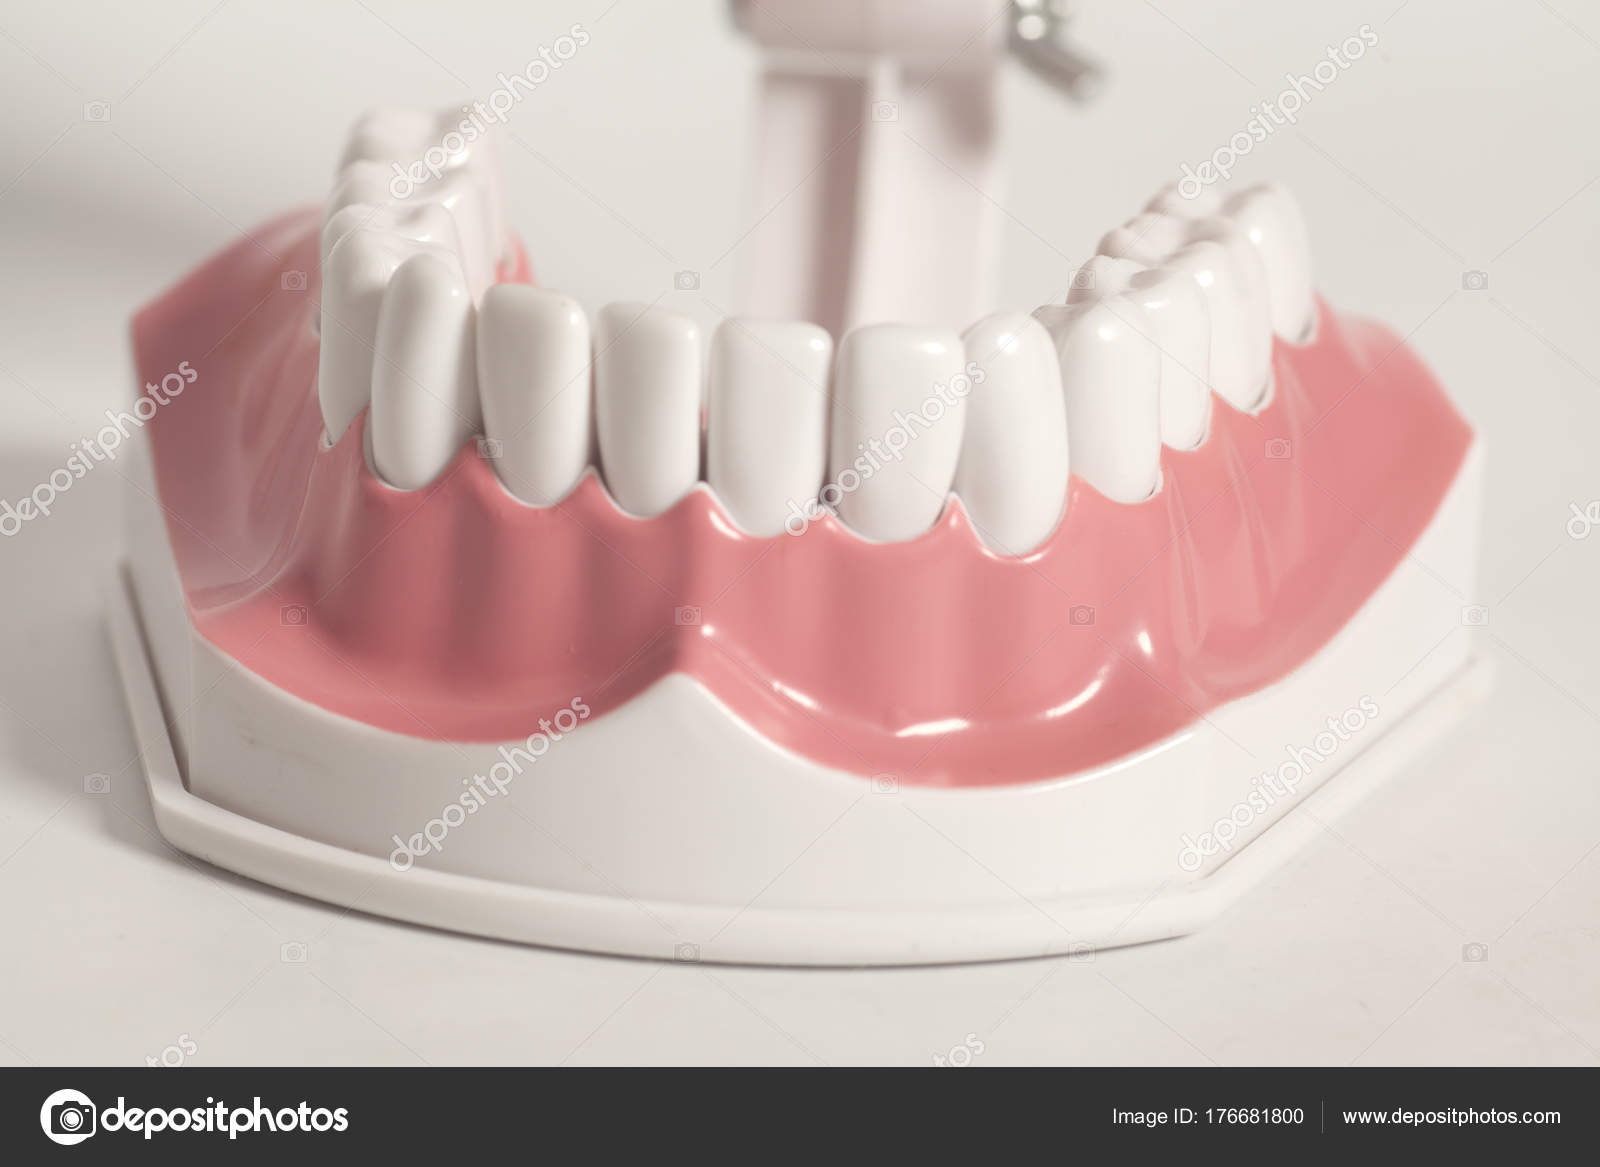 Modelo dental dientes humanos — Foto de stock © yurchello_108 #176681800